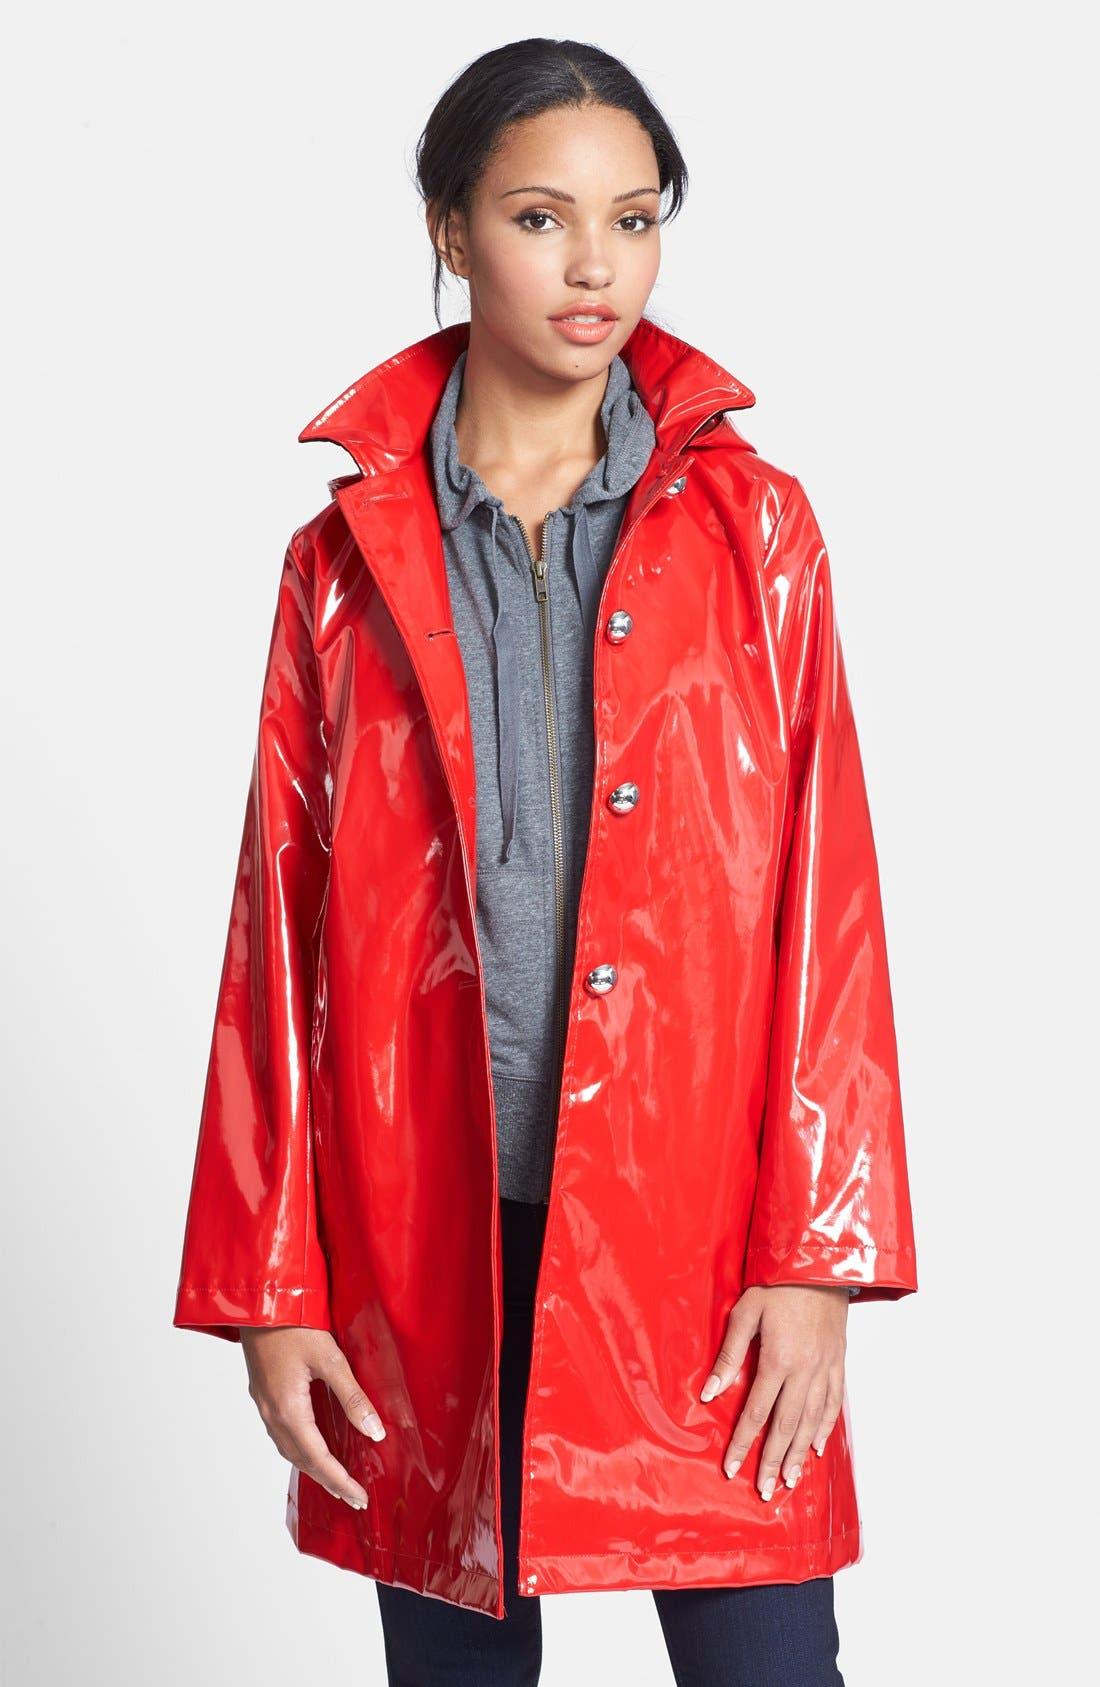 Alternate Image 1 Selected - Jane Post 'Princess' Rain Slicker with Detachable Hood